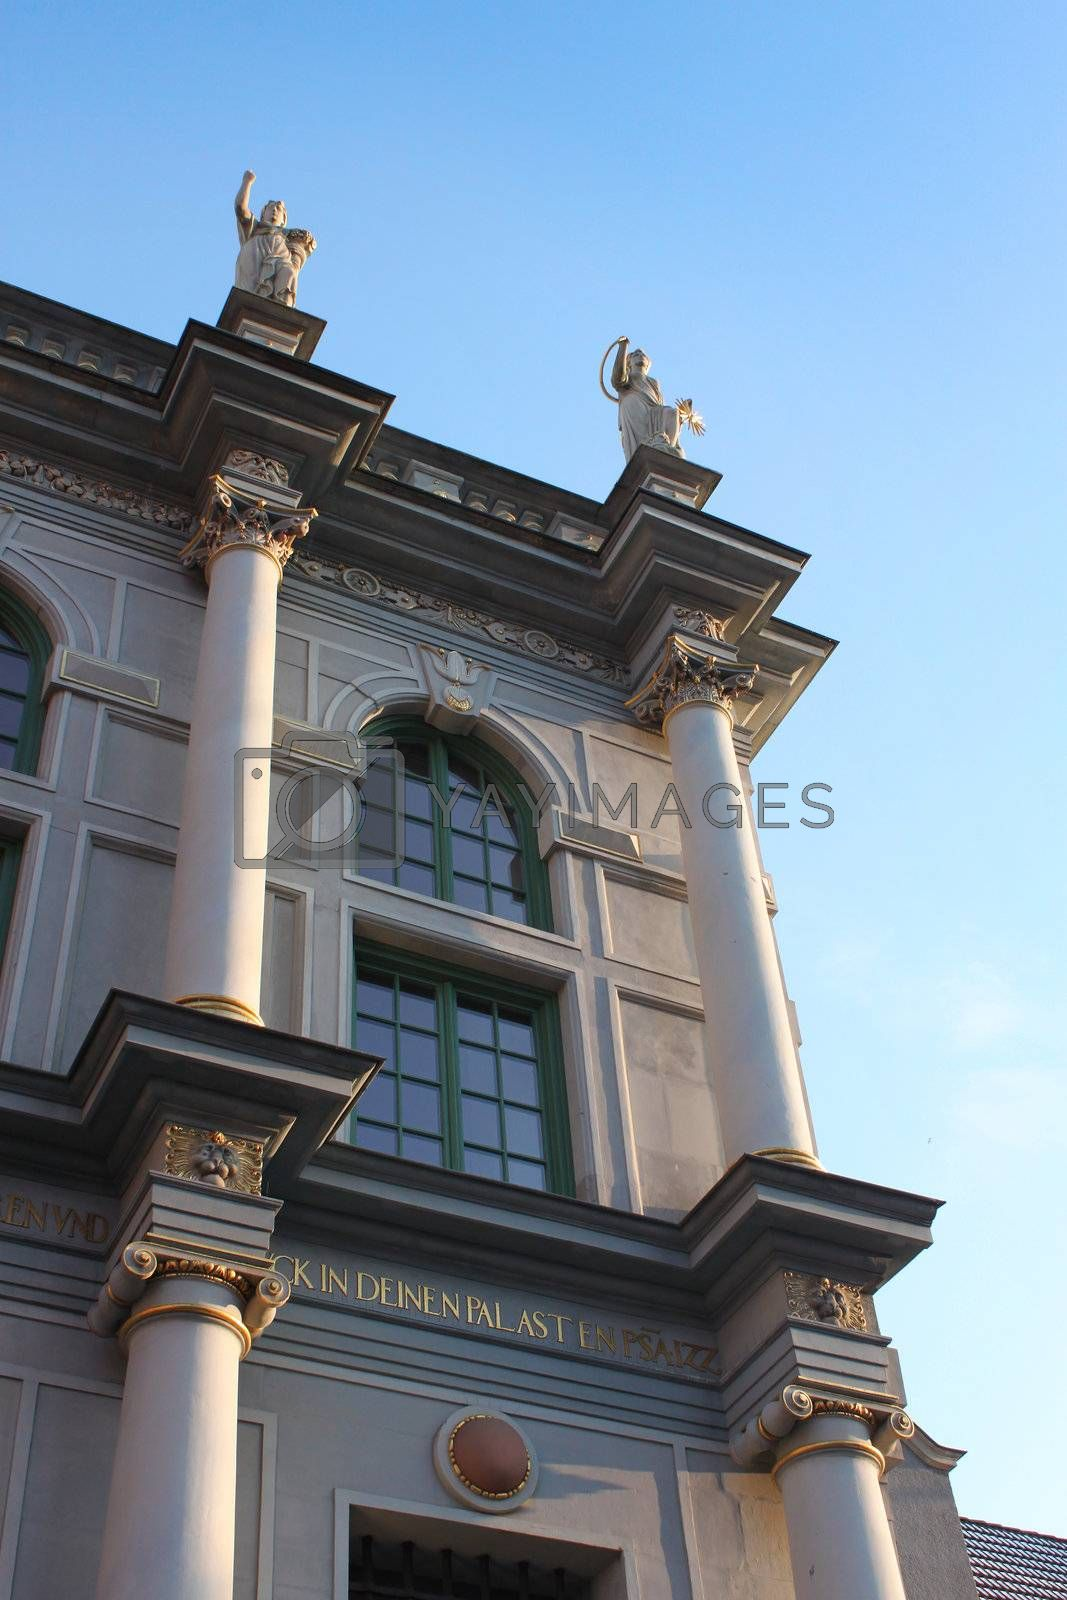 Architecture details  by cobalt